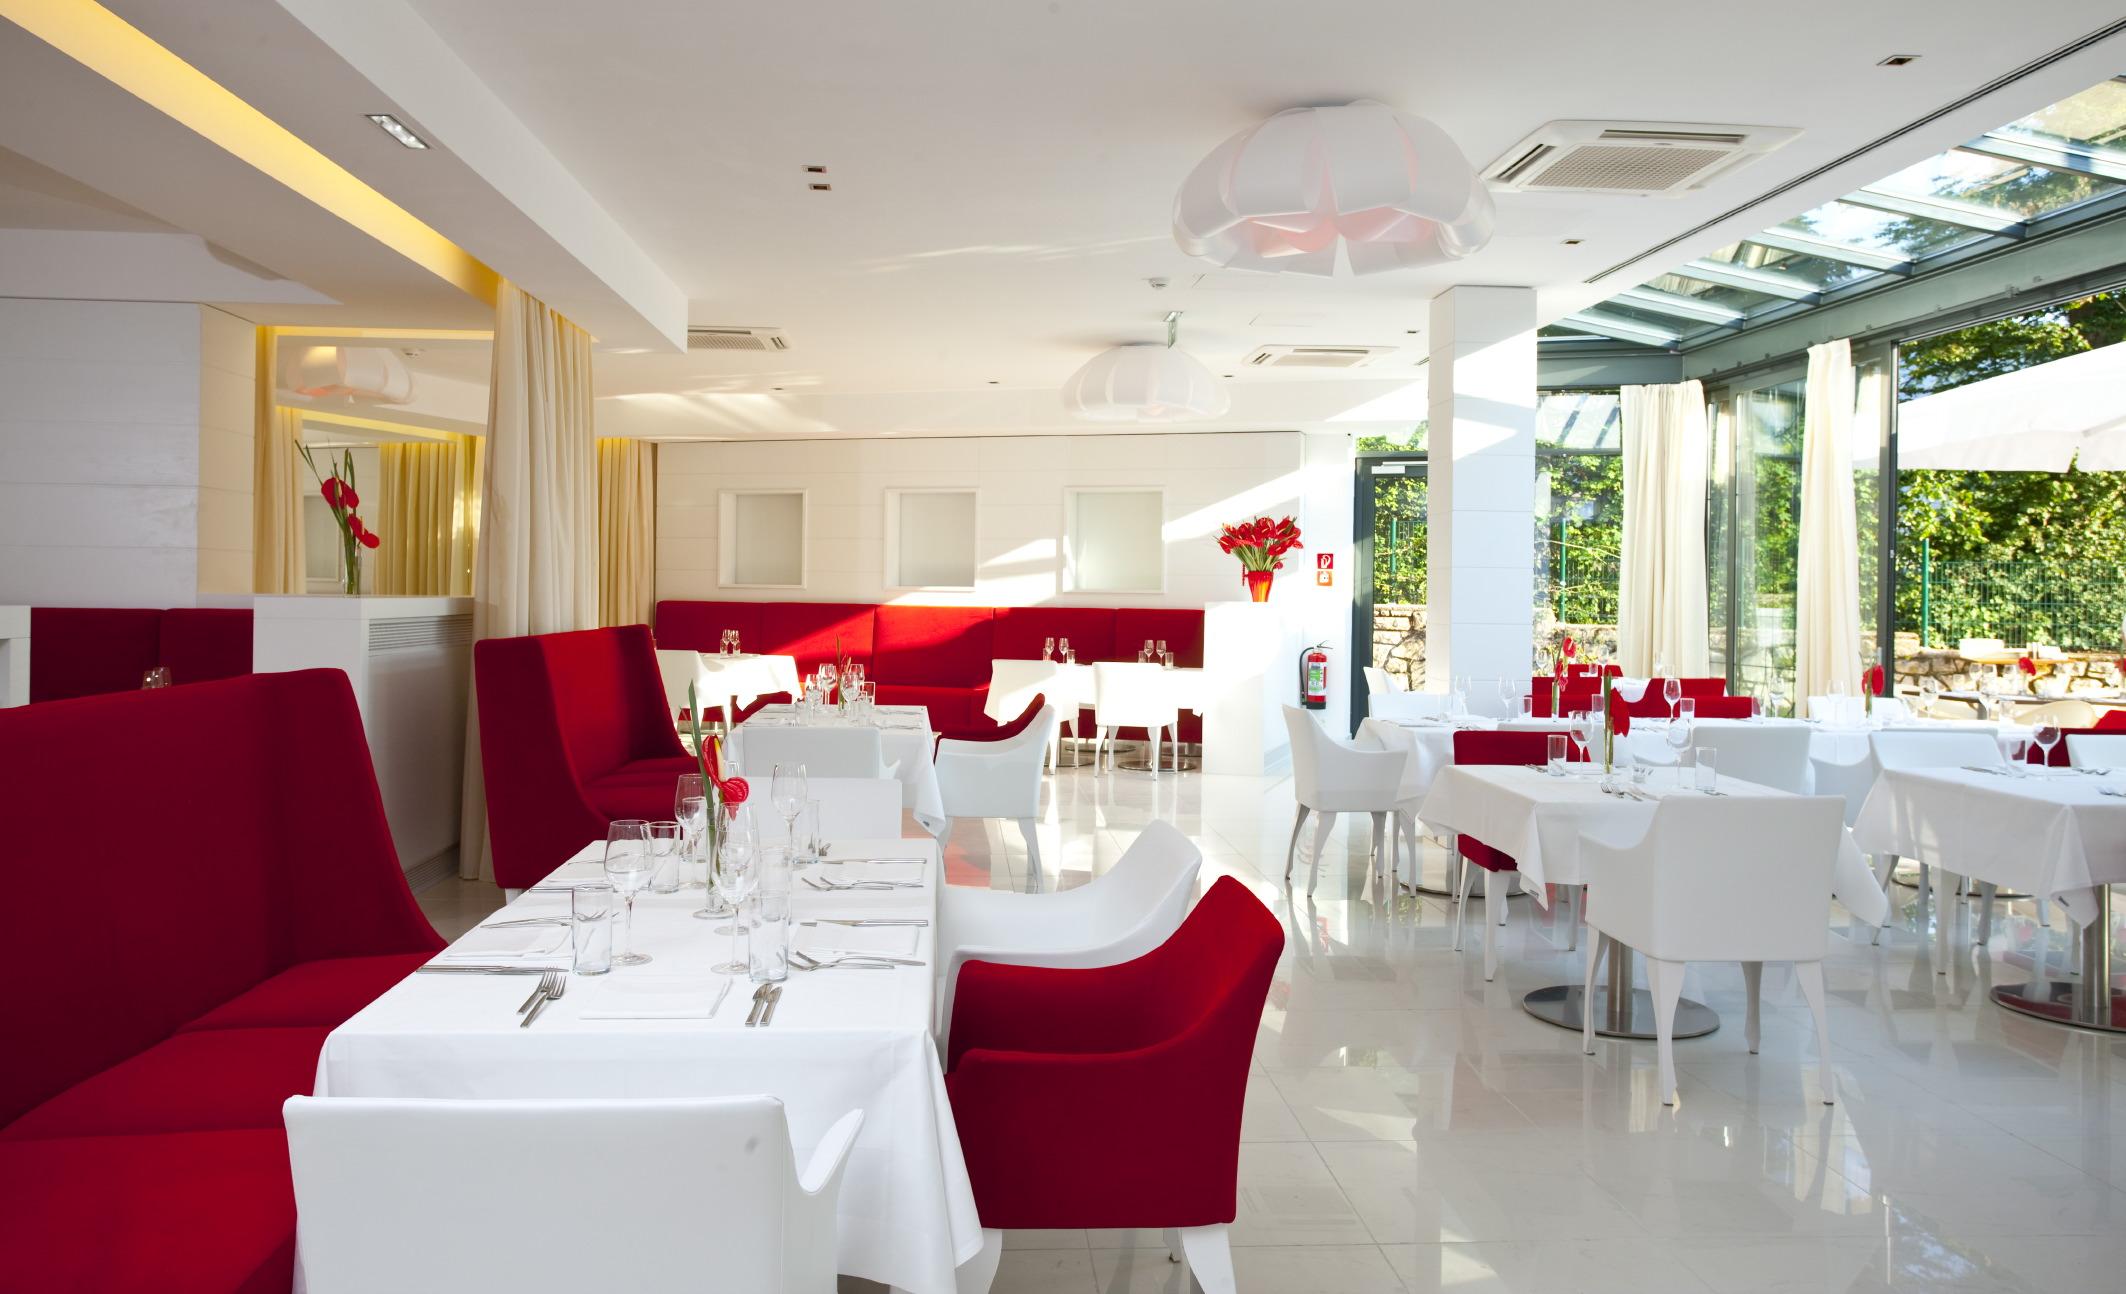 26-lakes-restaurant